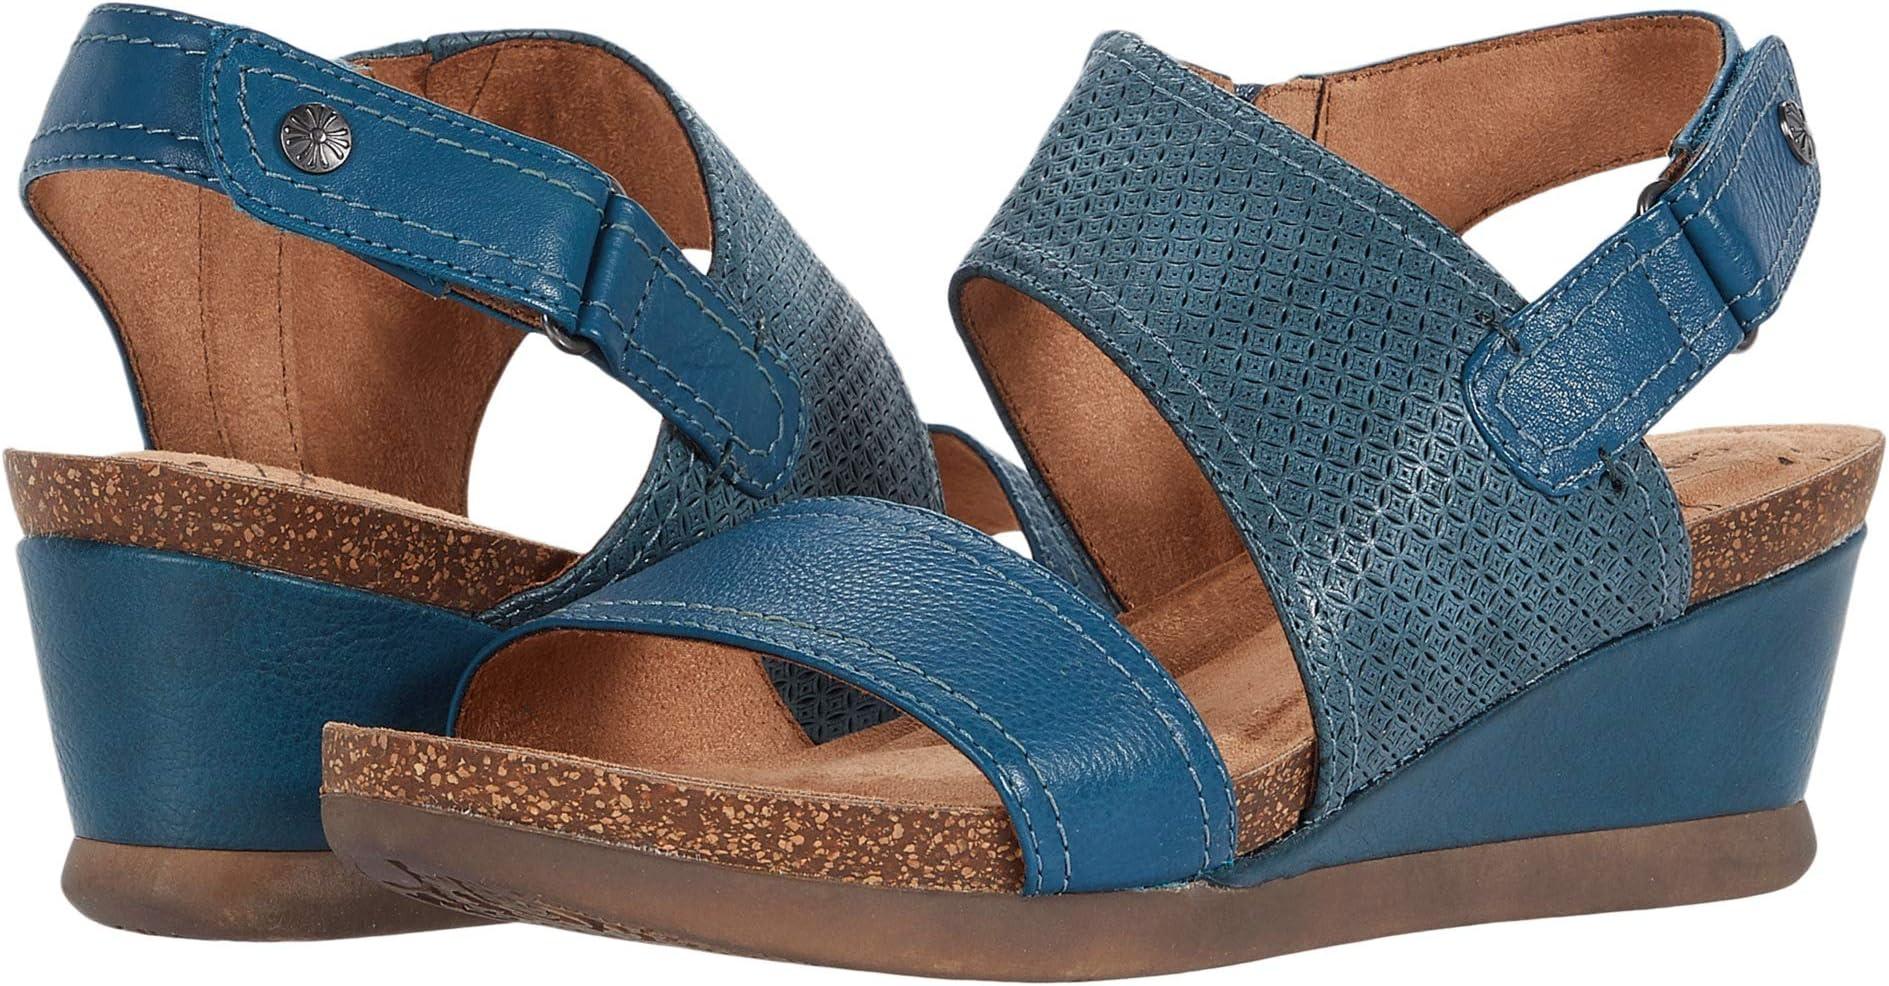 Cobb Hill Sandals